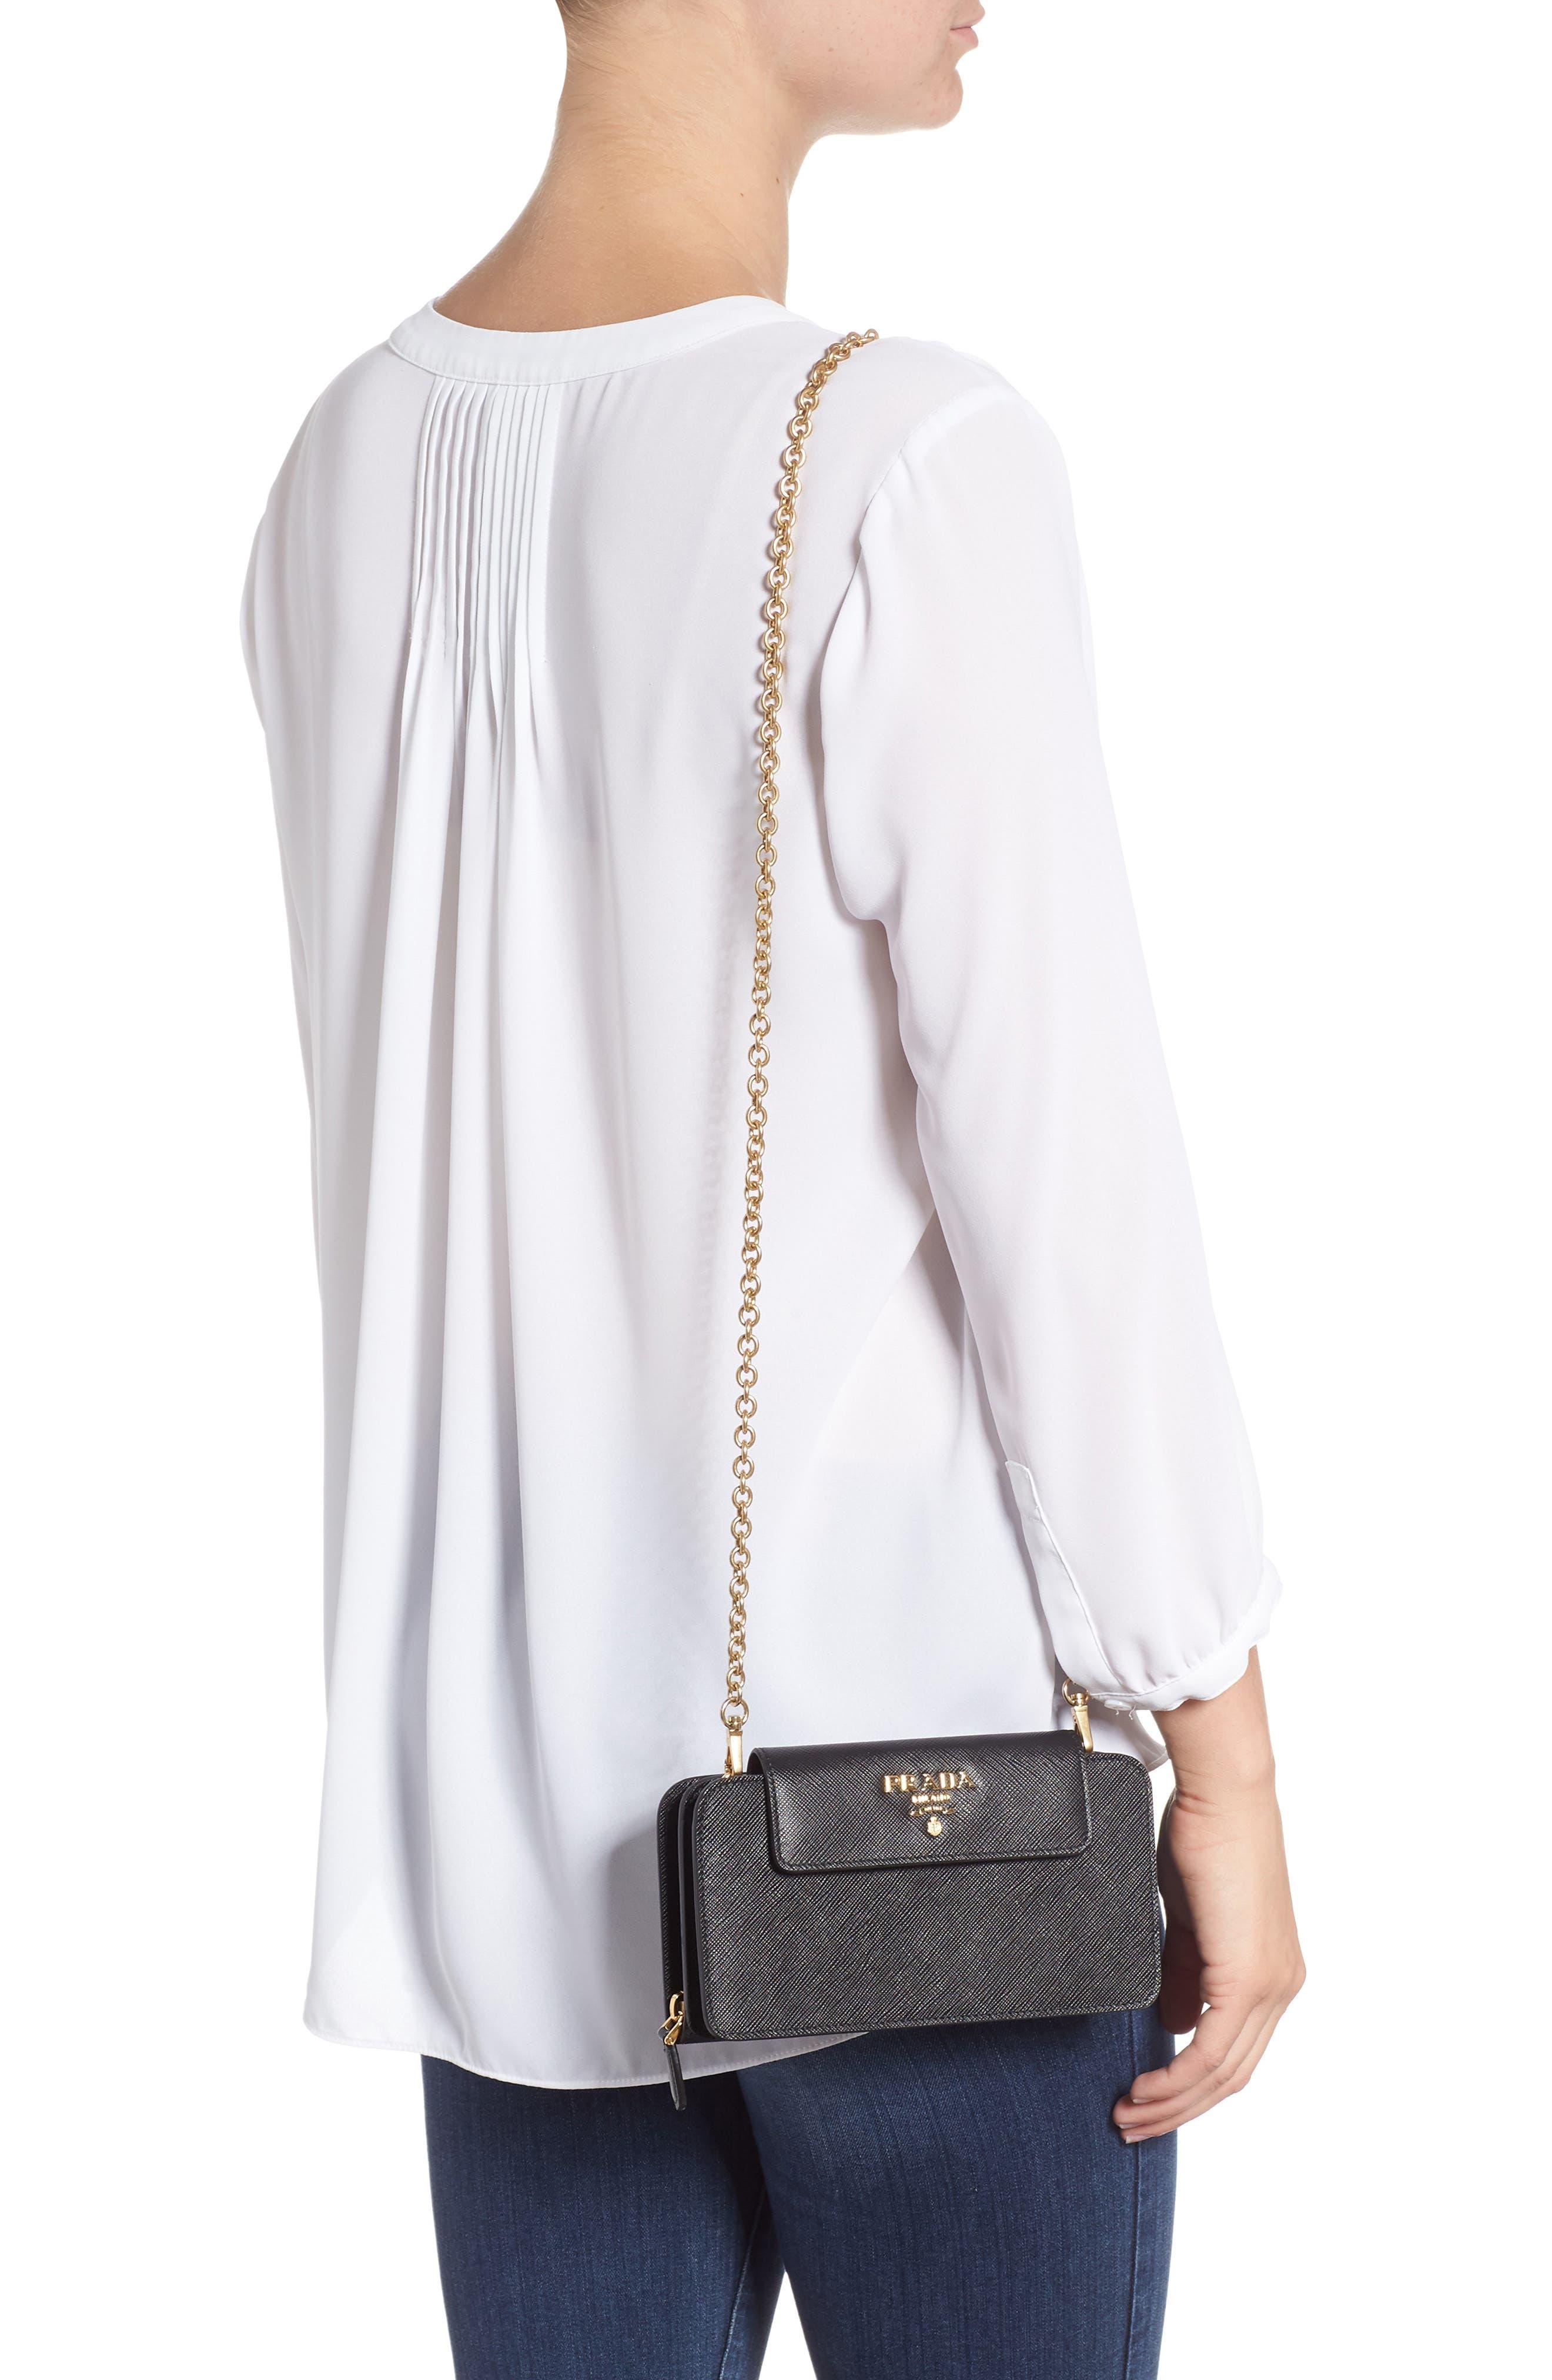 PRADA, Saffiano Leather Wallet on a Chain, Alternate thumbnail 2, color, NERO